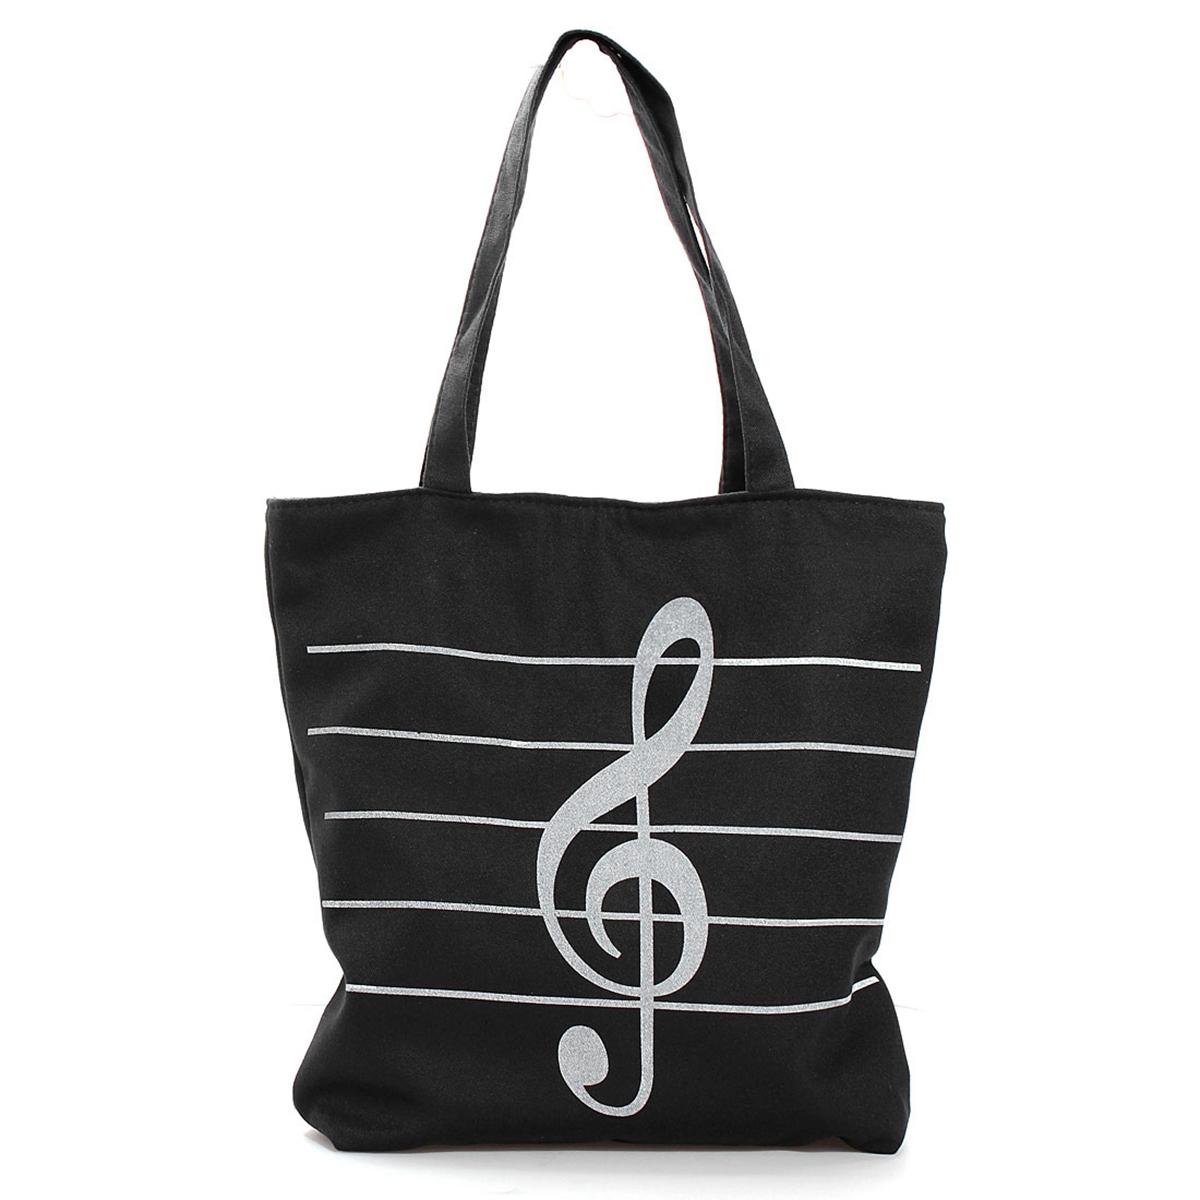 Women Casual Canvas Musical Note Tote Shopping Shoulder Bag Girl Handbag Satchel